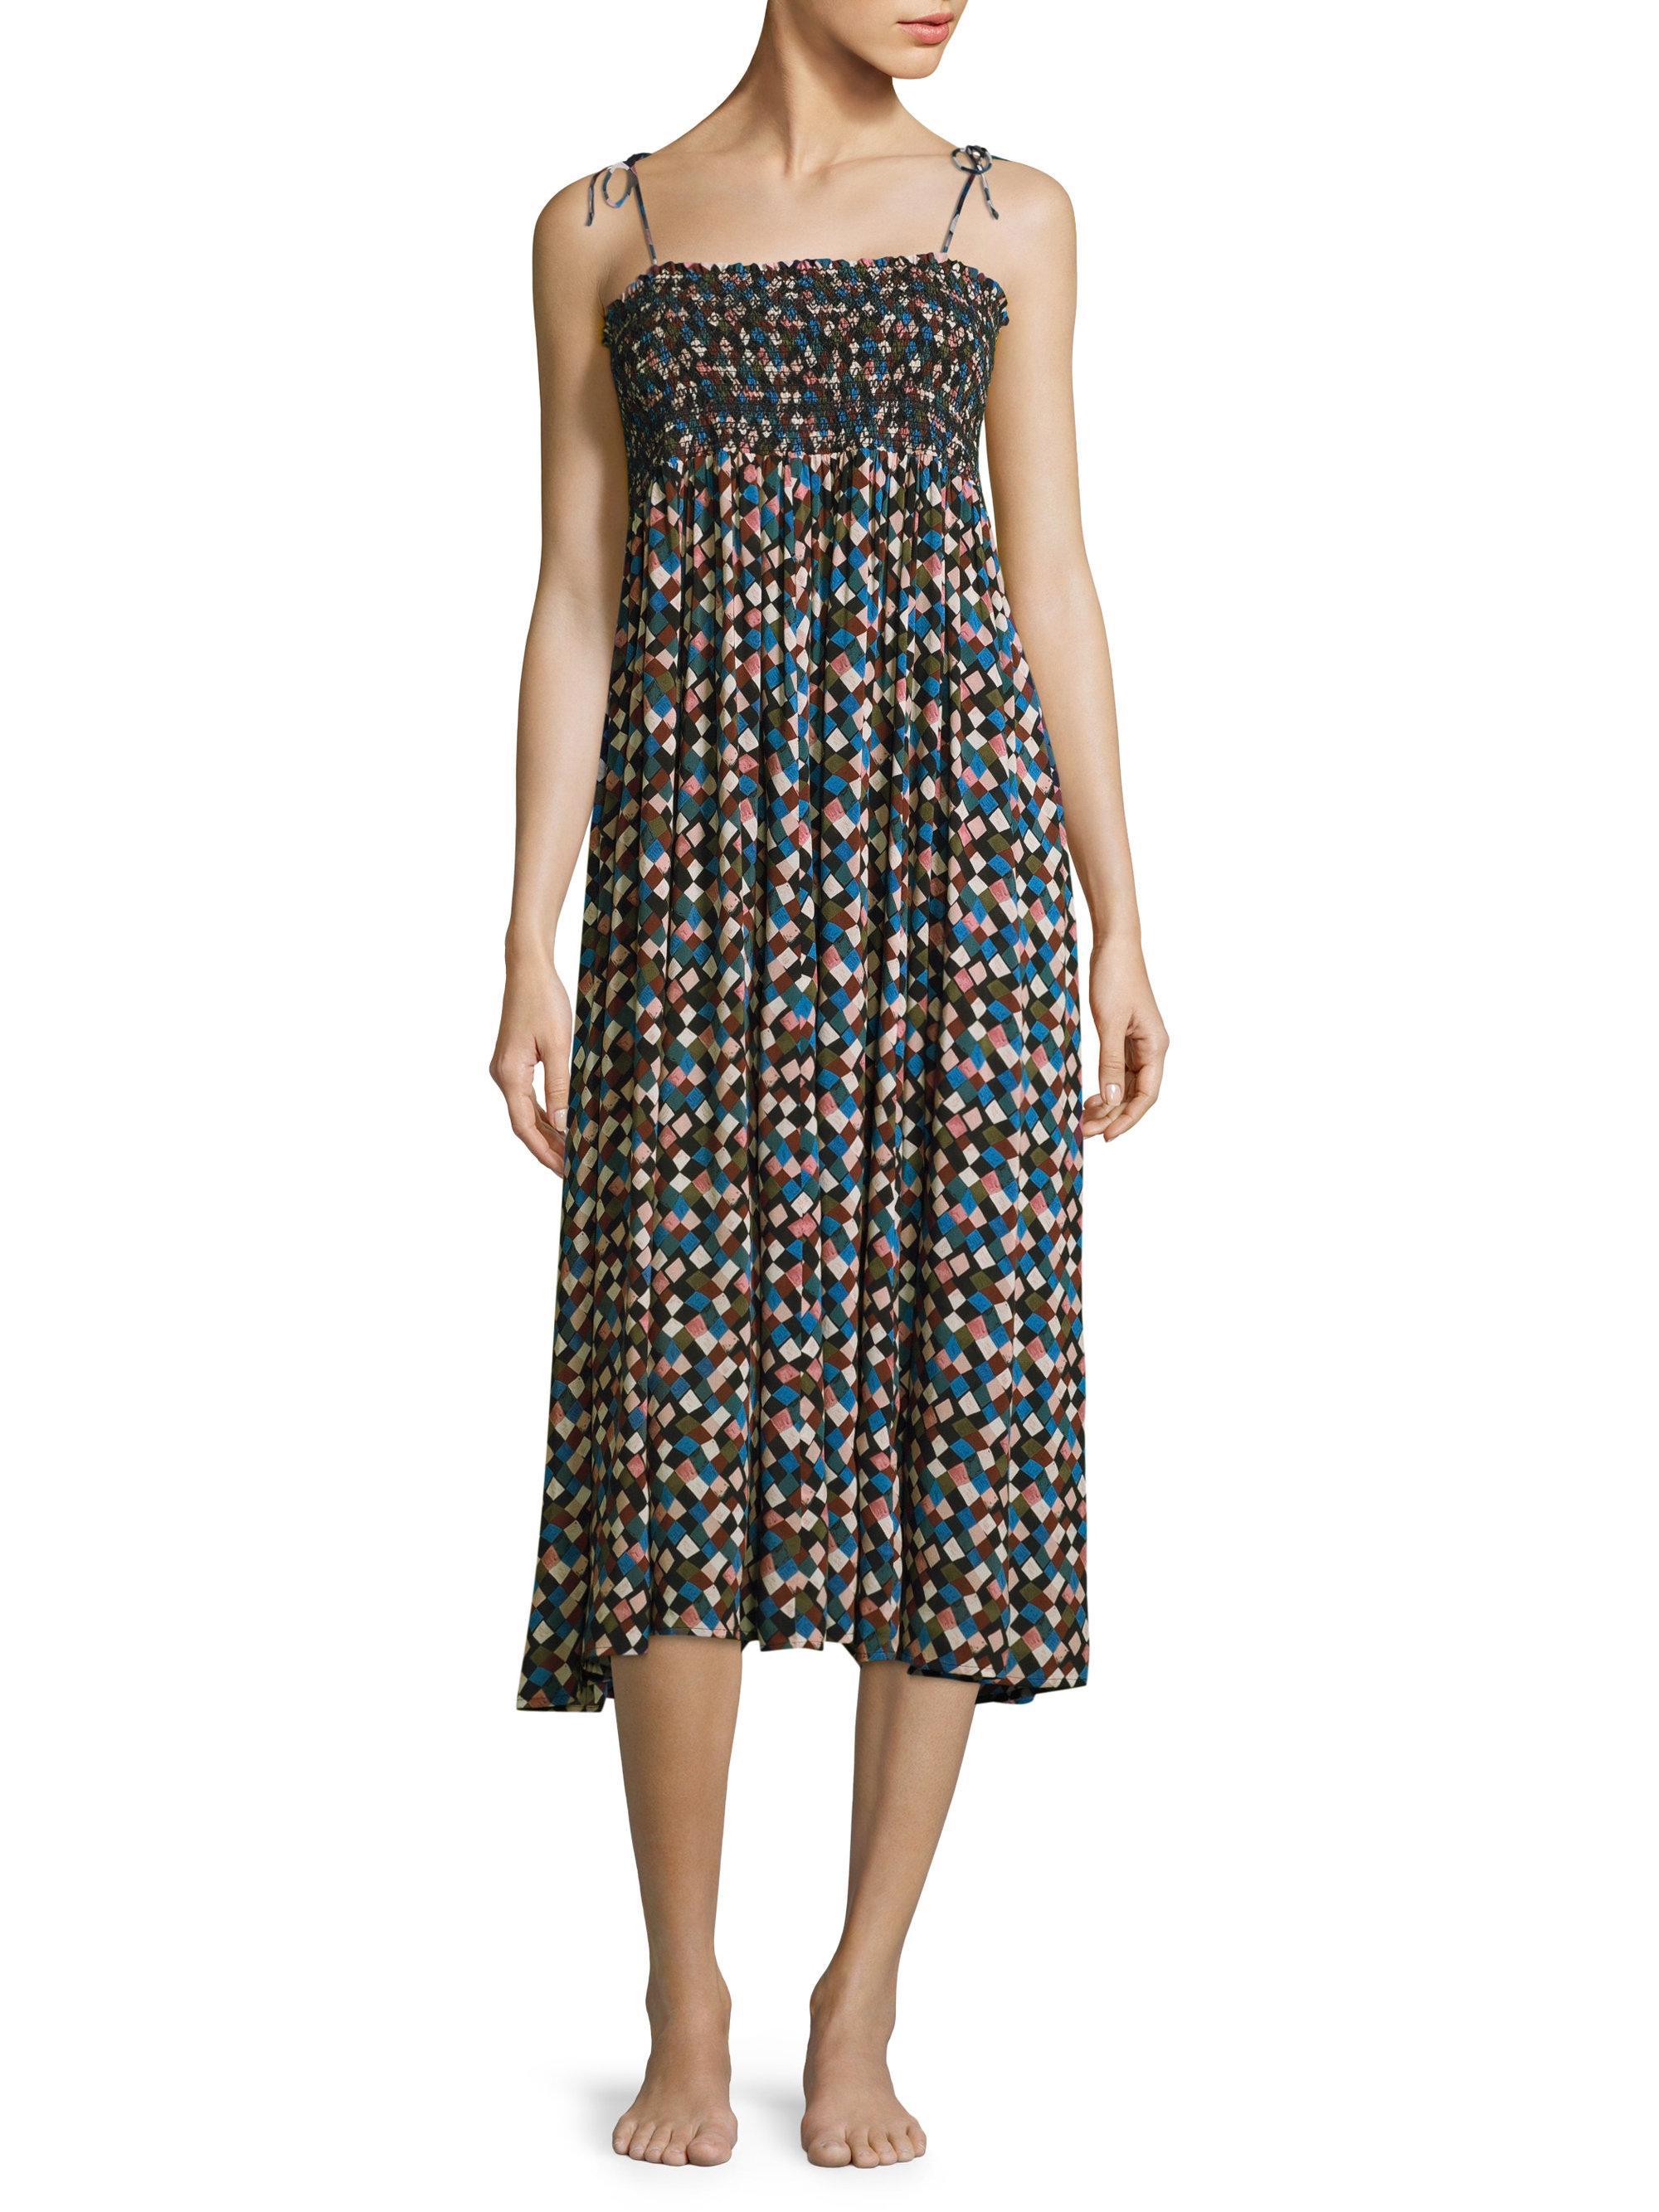 a1c846a12942f Tory Burch Clemence Convertible Dress - Lyst